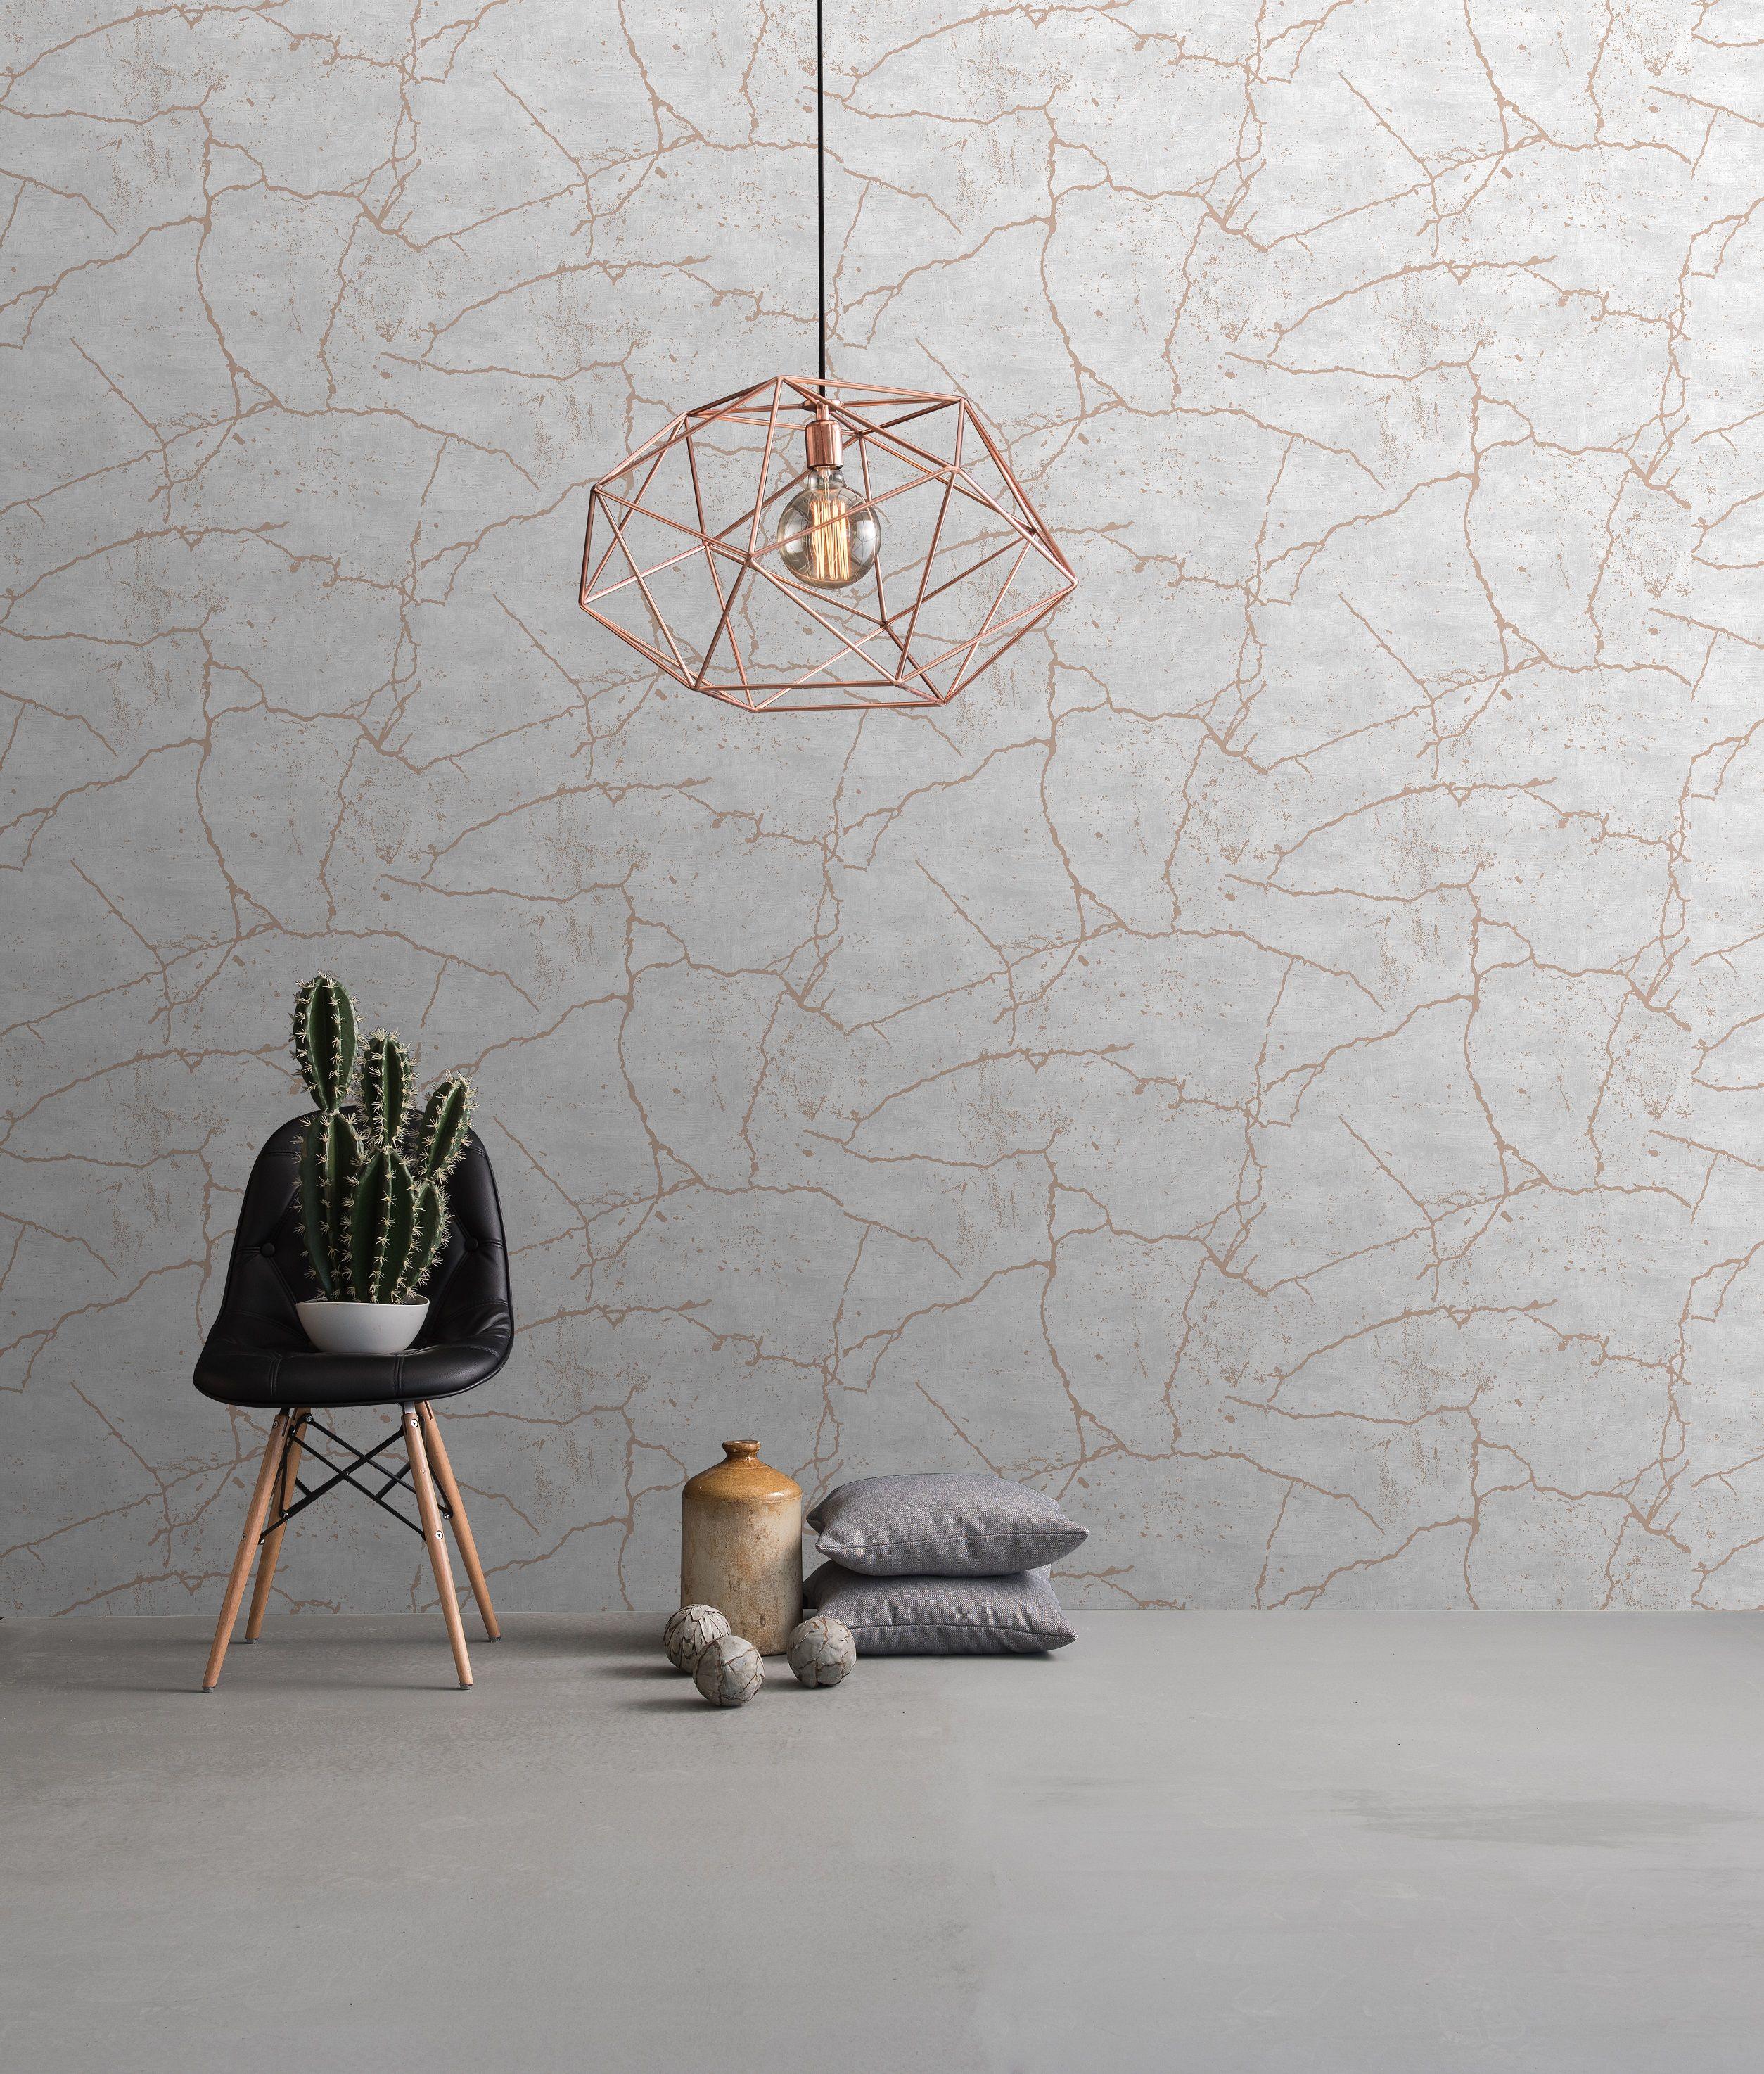 Vliestapete Kintsugi Optik beige grau rose gold metallic  Tapete